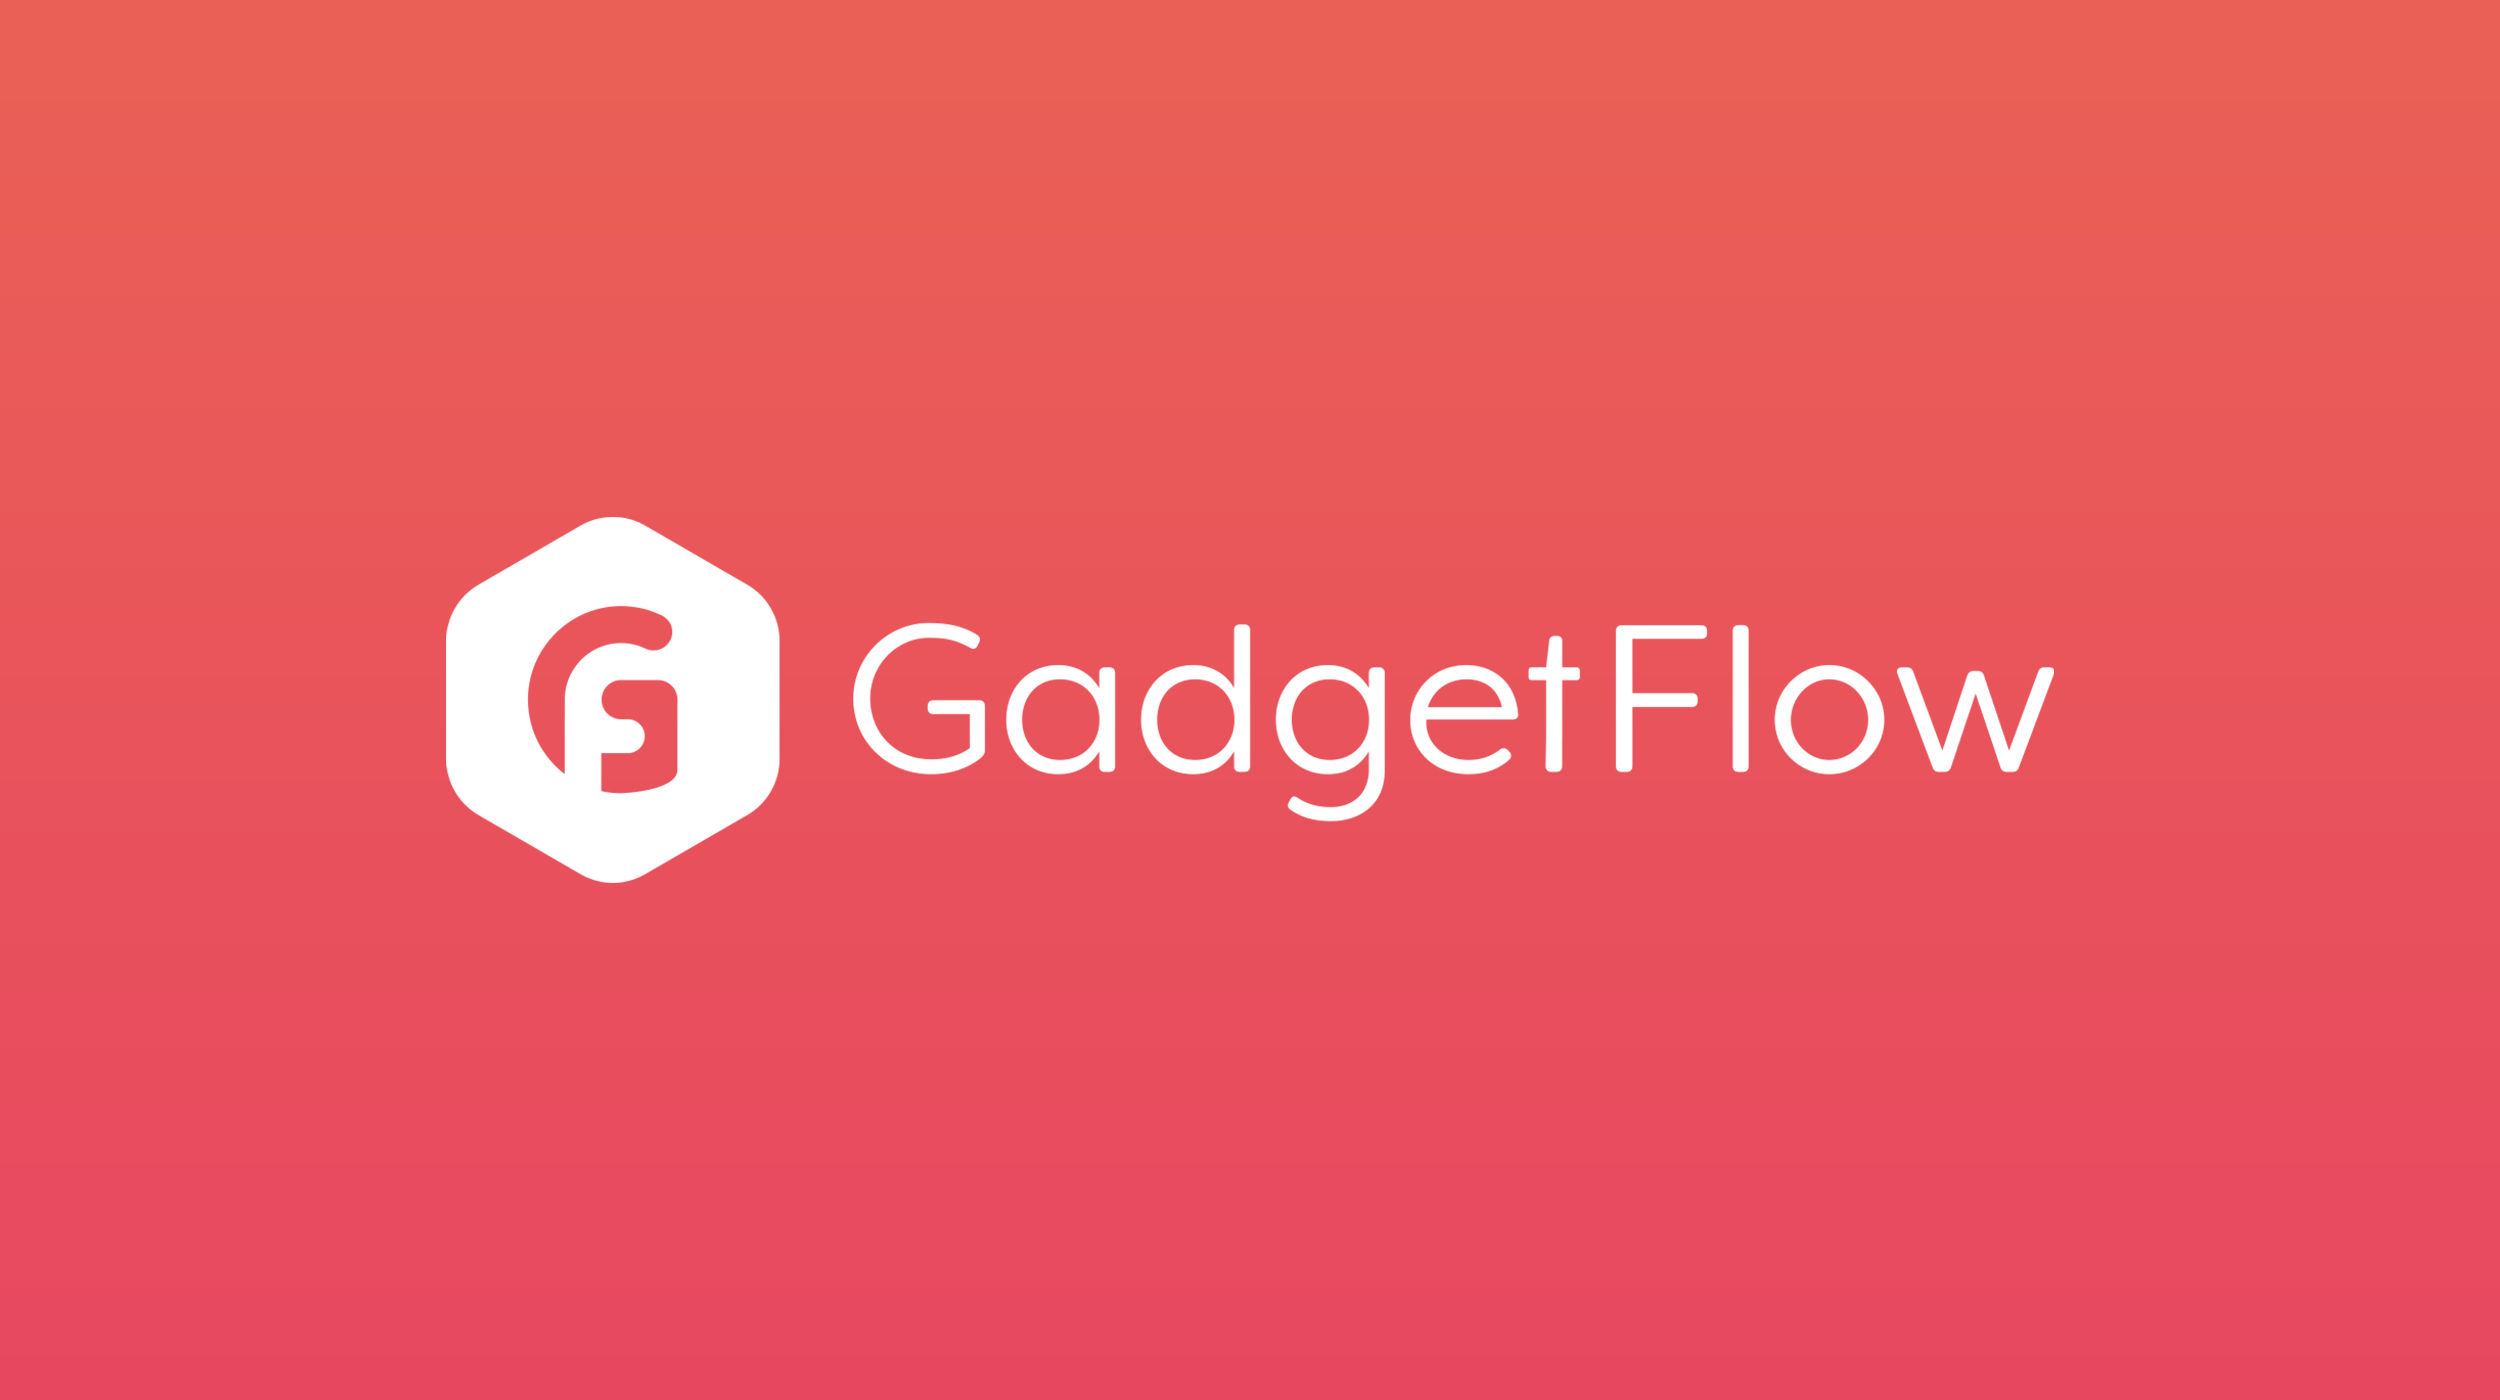 Gadget_Flow_Logo_(35197194175).jpg